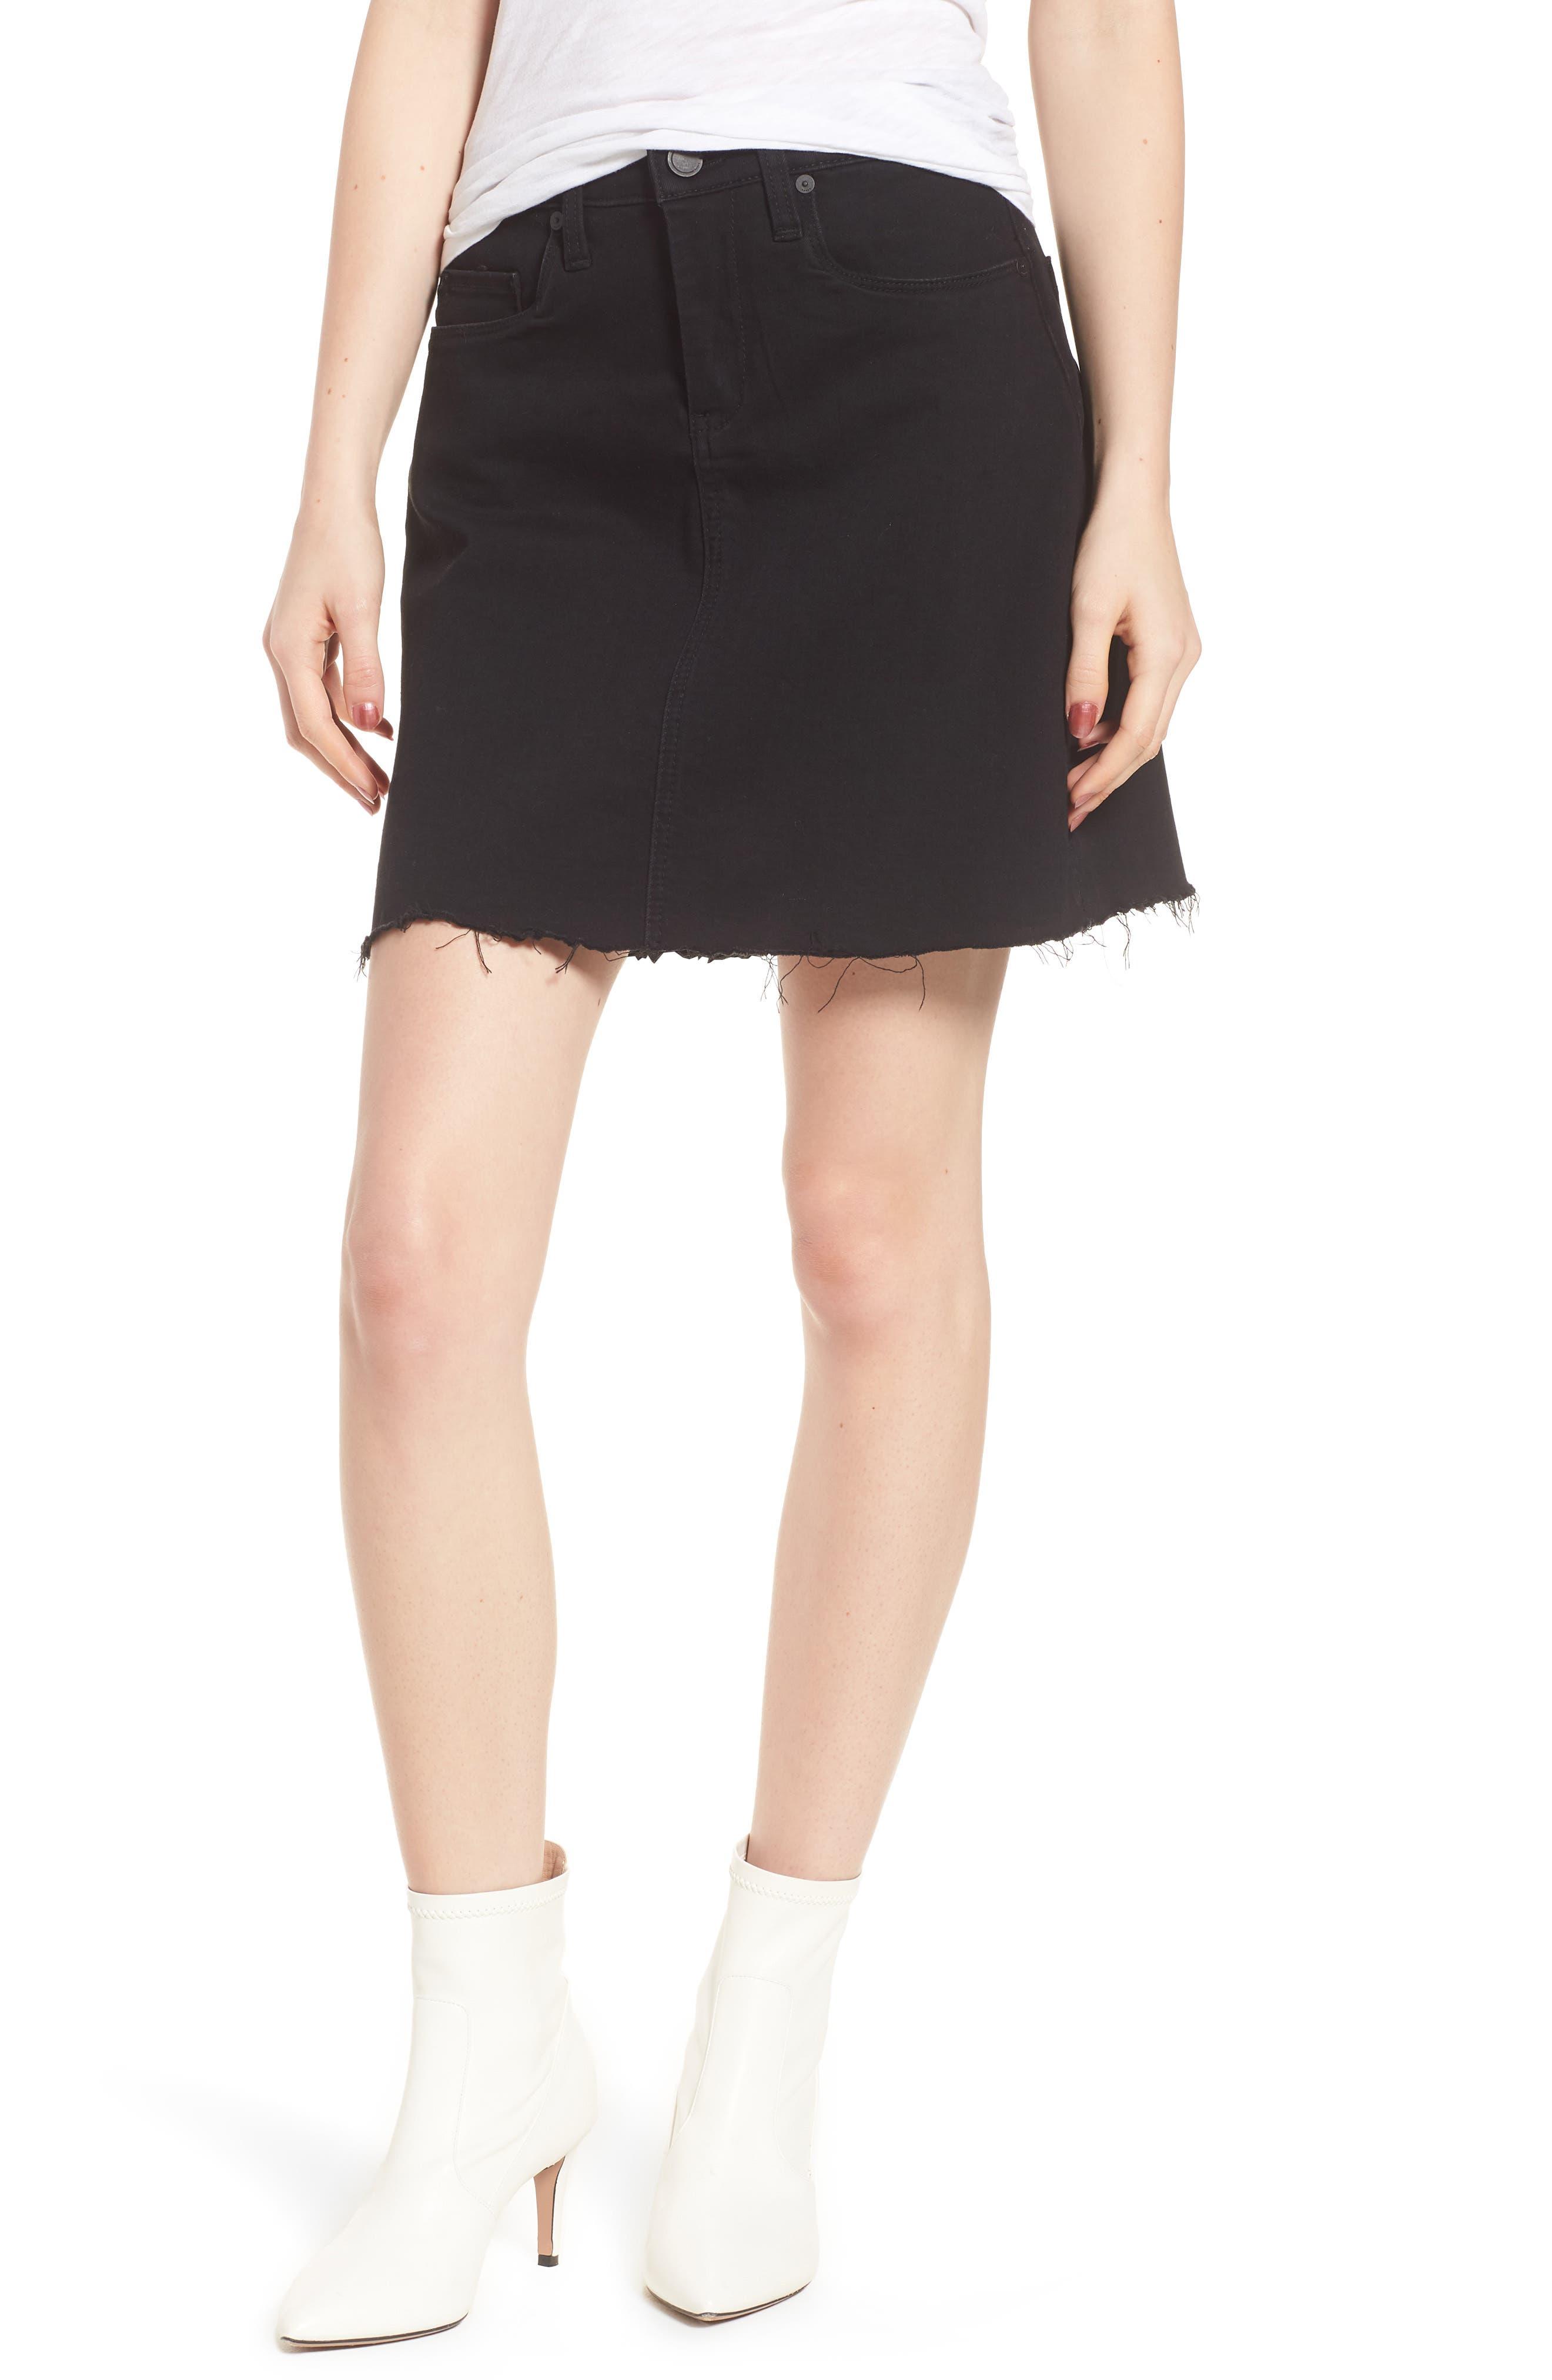 Blanknyc Denim Skirt, 7 - Black